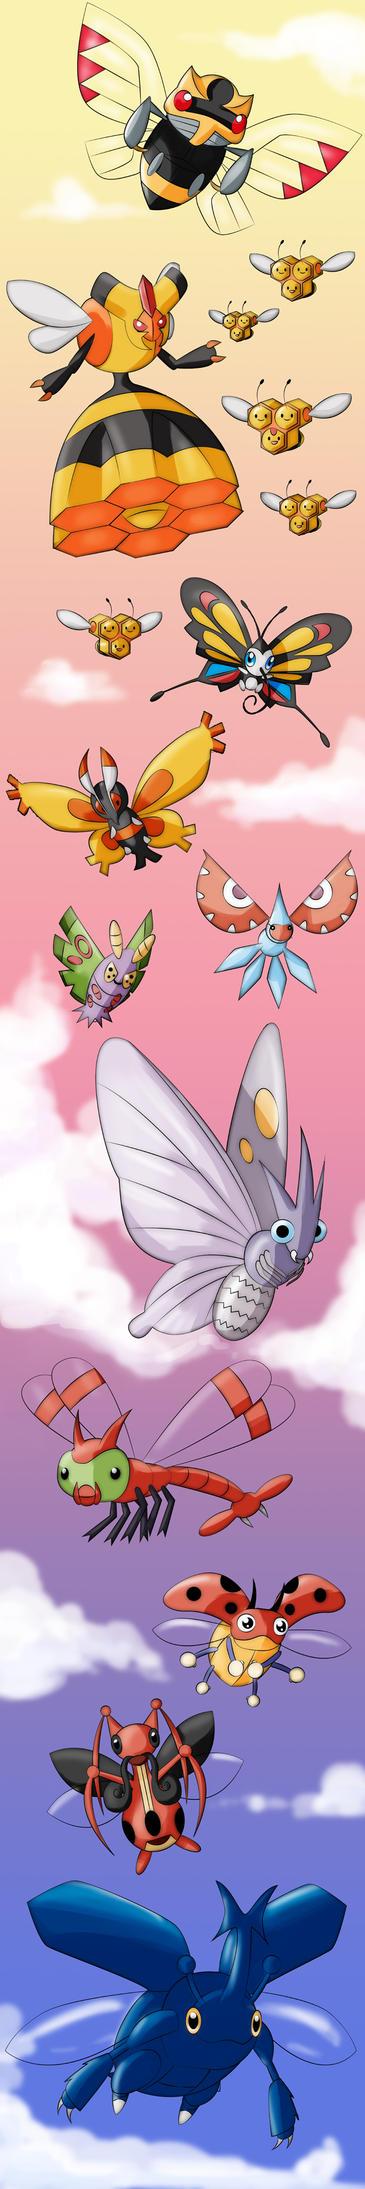 Diamond/Pearl/Platinum HM chart and Pokémon compatibility